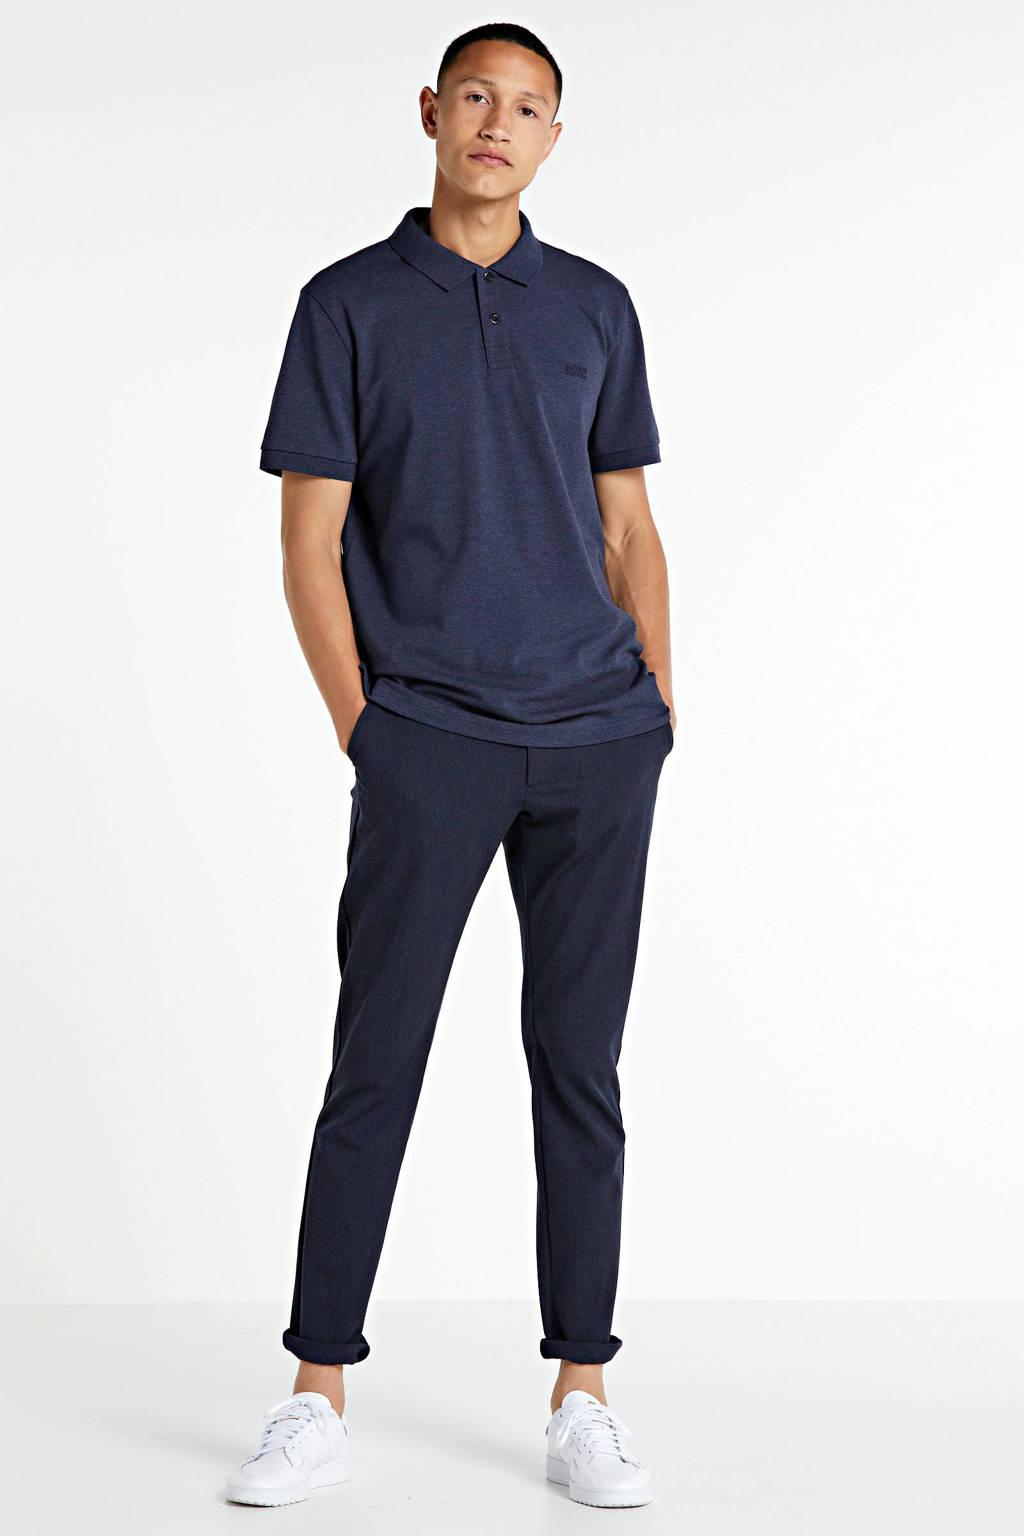 BOSS Athleisure Big & Tall regular fit polo donkerblauw, Donkerblauw